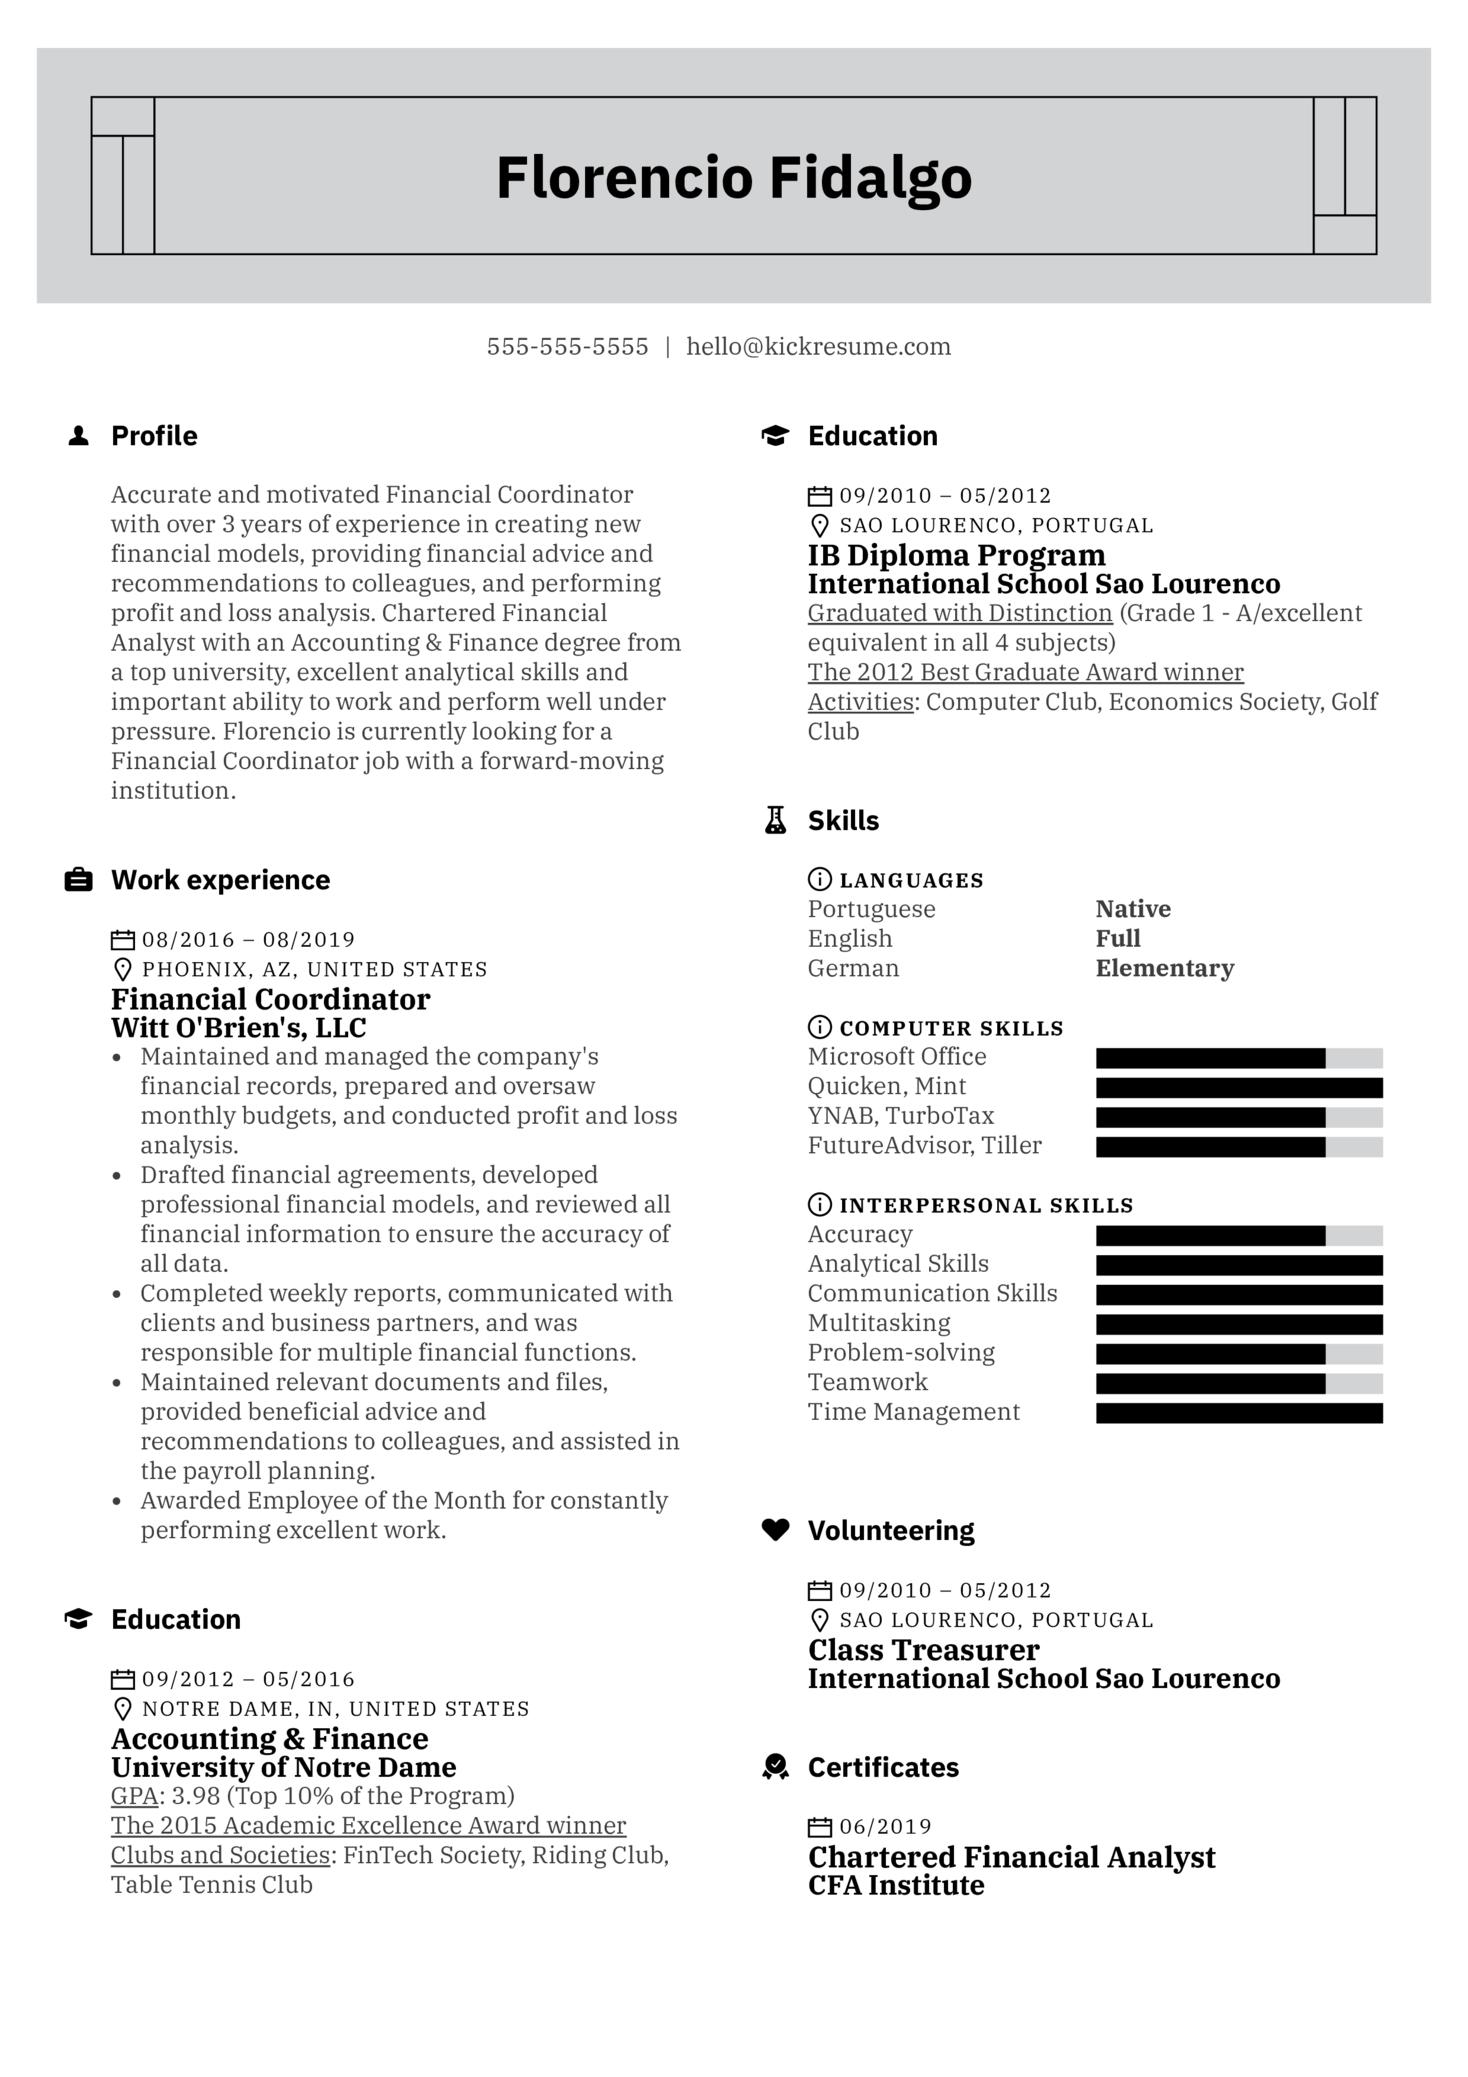 Financial Coordinator Resume Example (Teil 1)